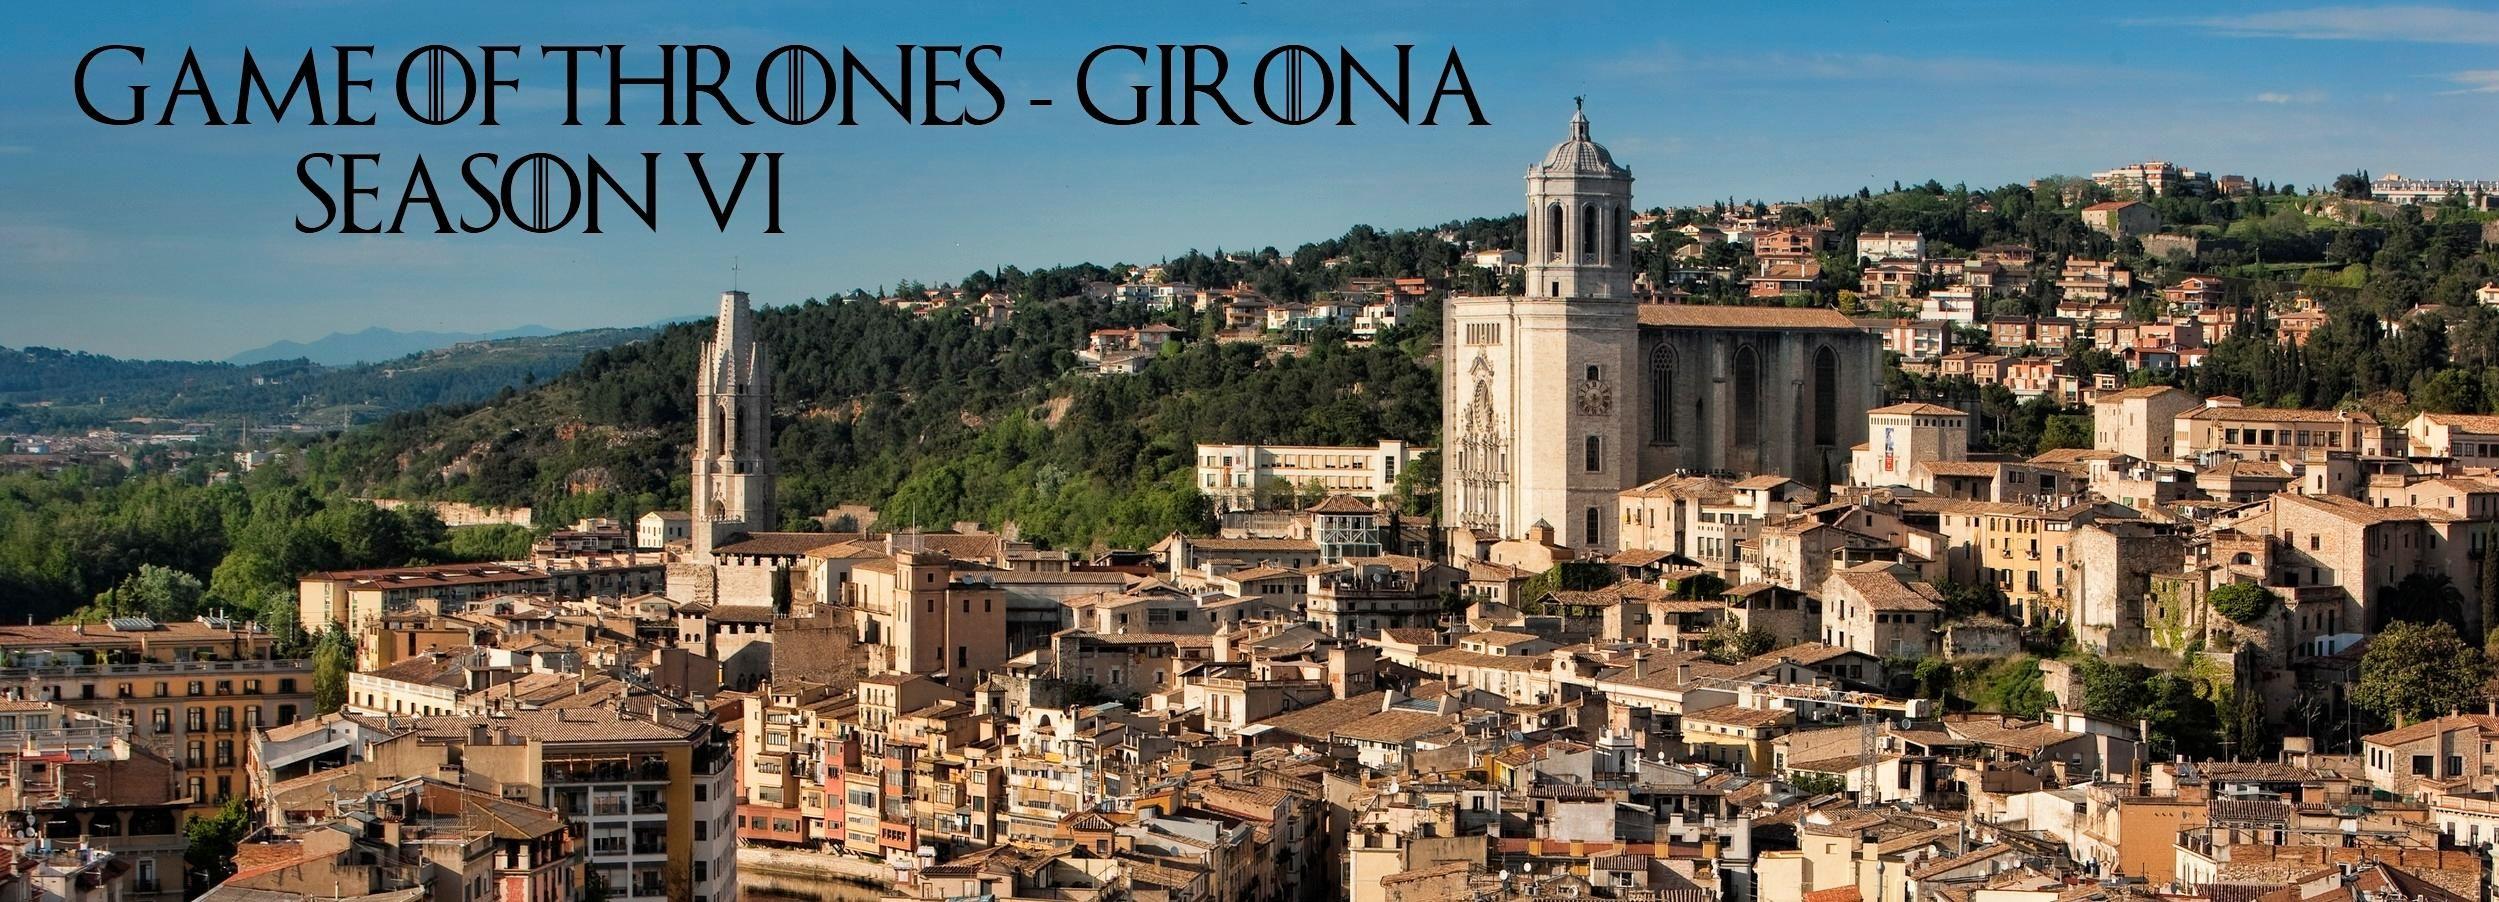 Girona: Game of Thrones Small Group Tour